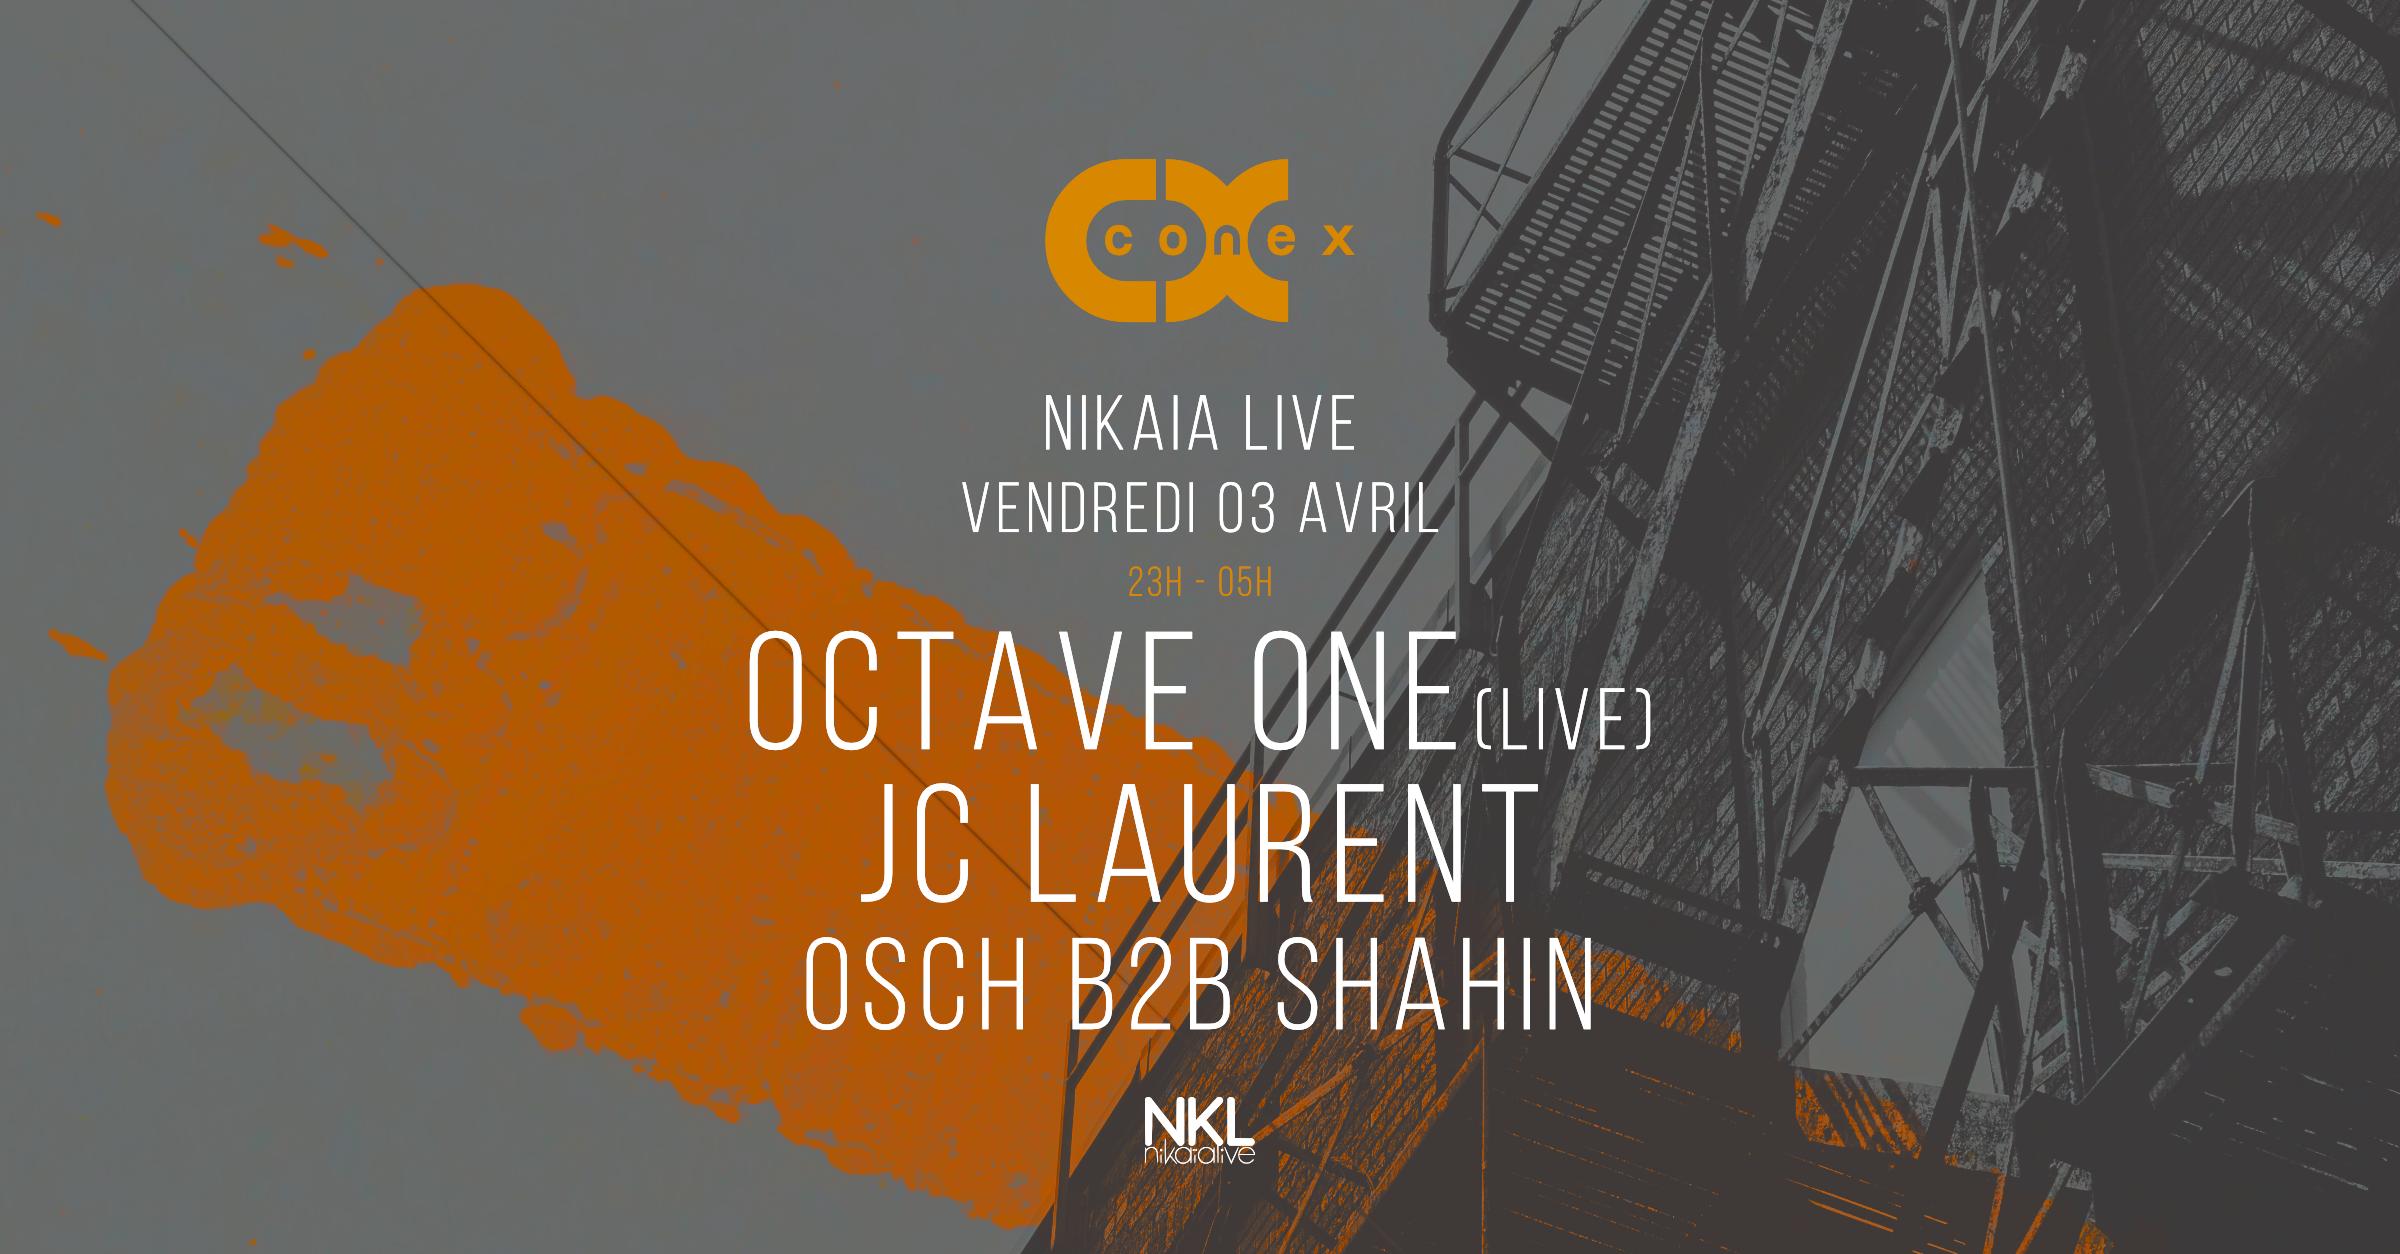 [ANNULÉ] Conex :: Octave ONE (live), & More TBC at Nikaia Live